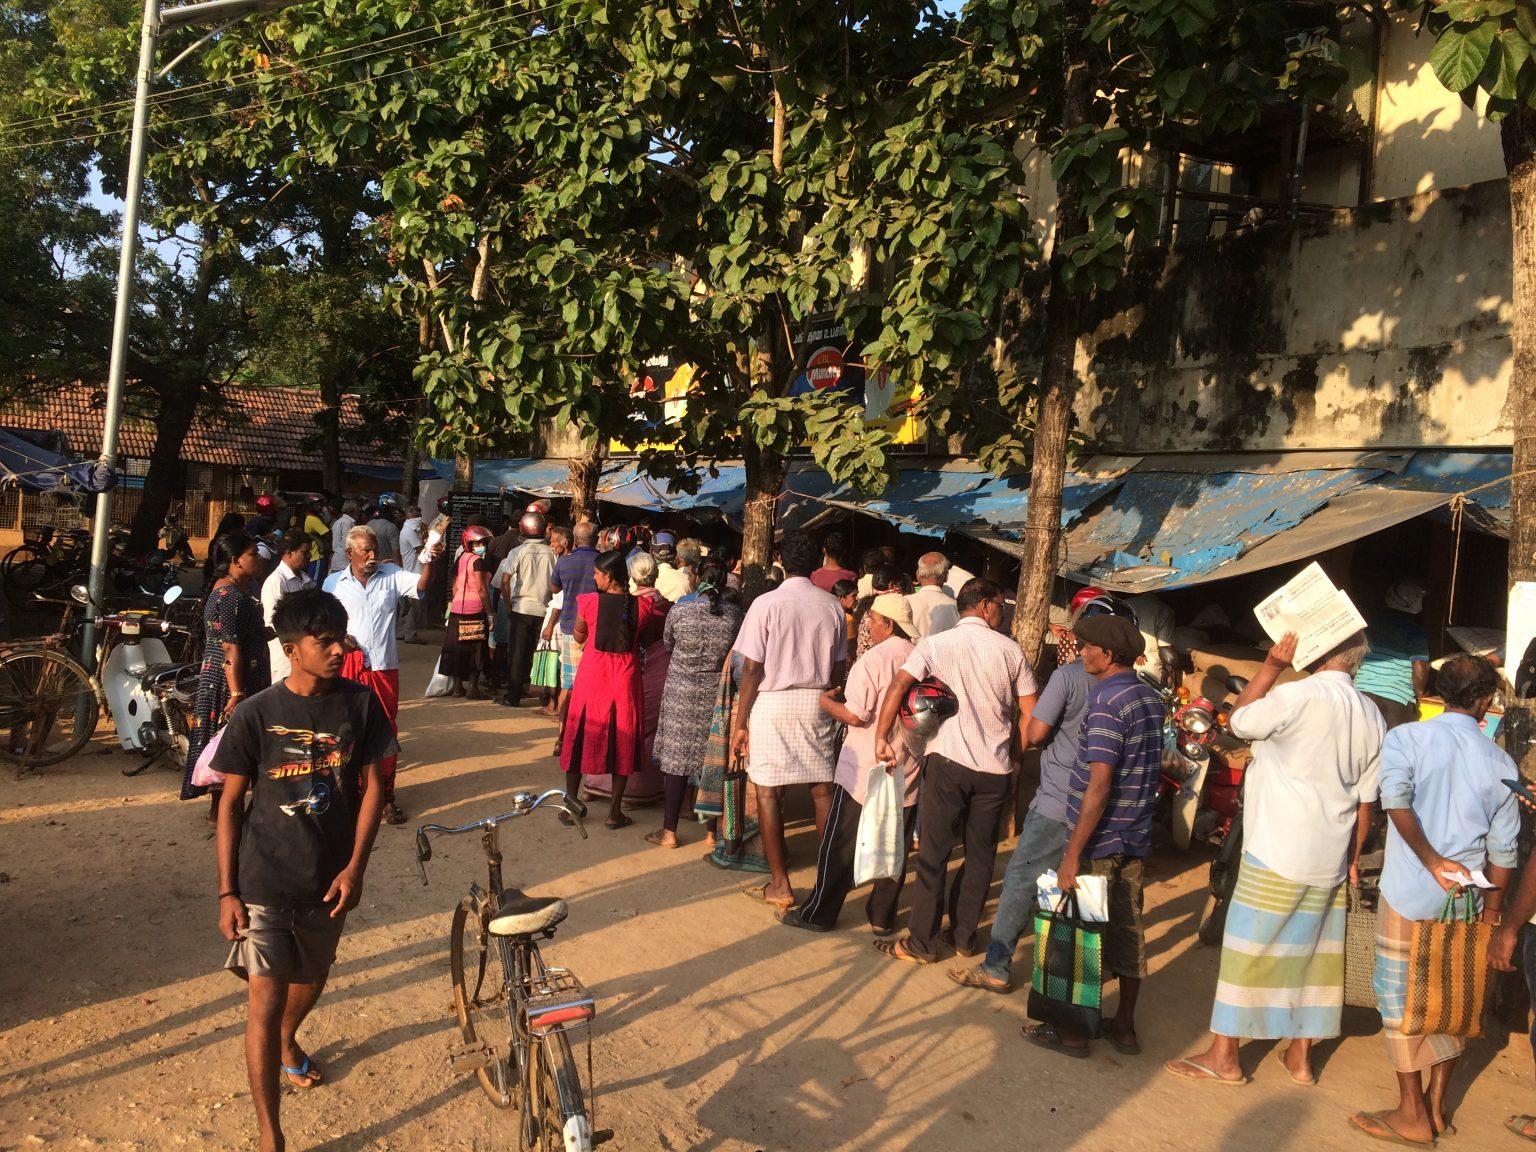 Curfew-Release-Time-Jaffna-Situation-Coronavirus-Alert-Situation-8-1536x1152